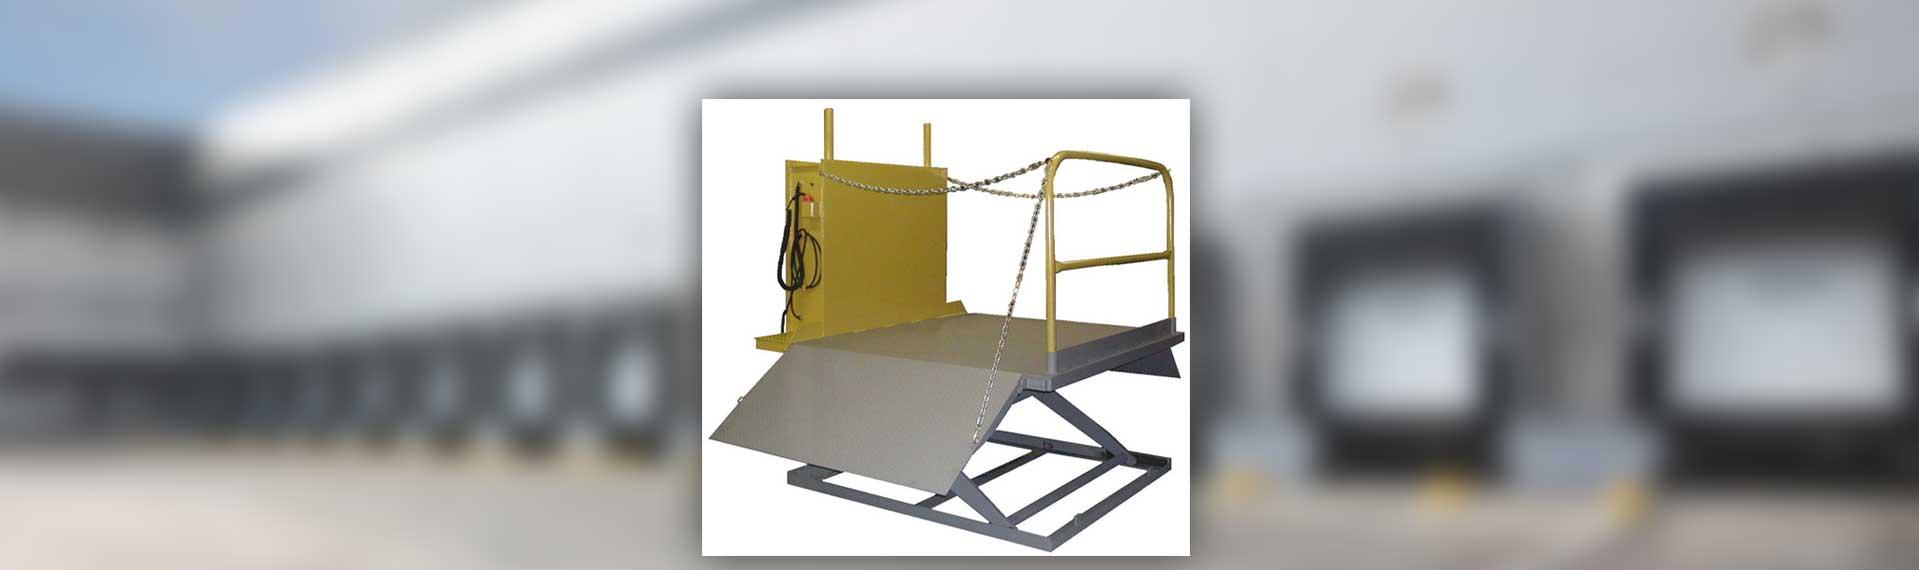 YARD-RAMP-SITE dock lift surface mount